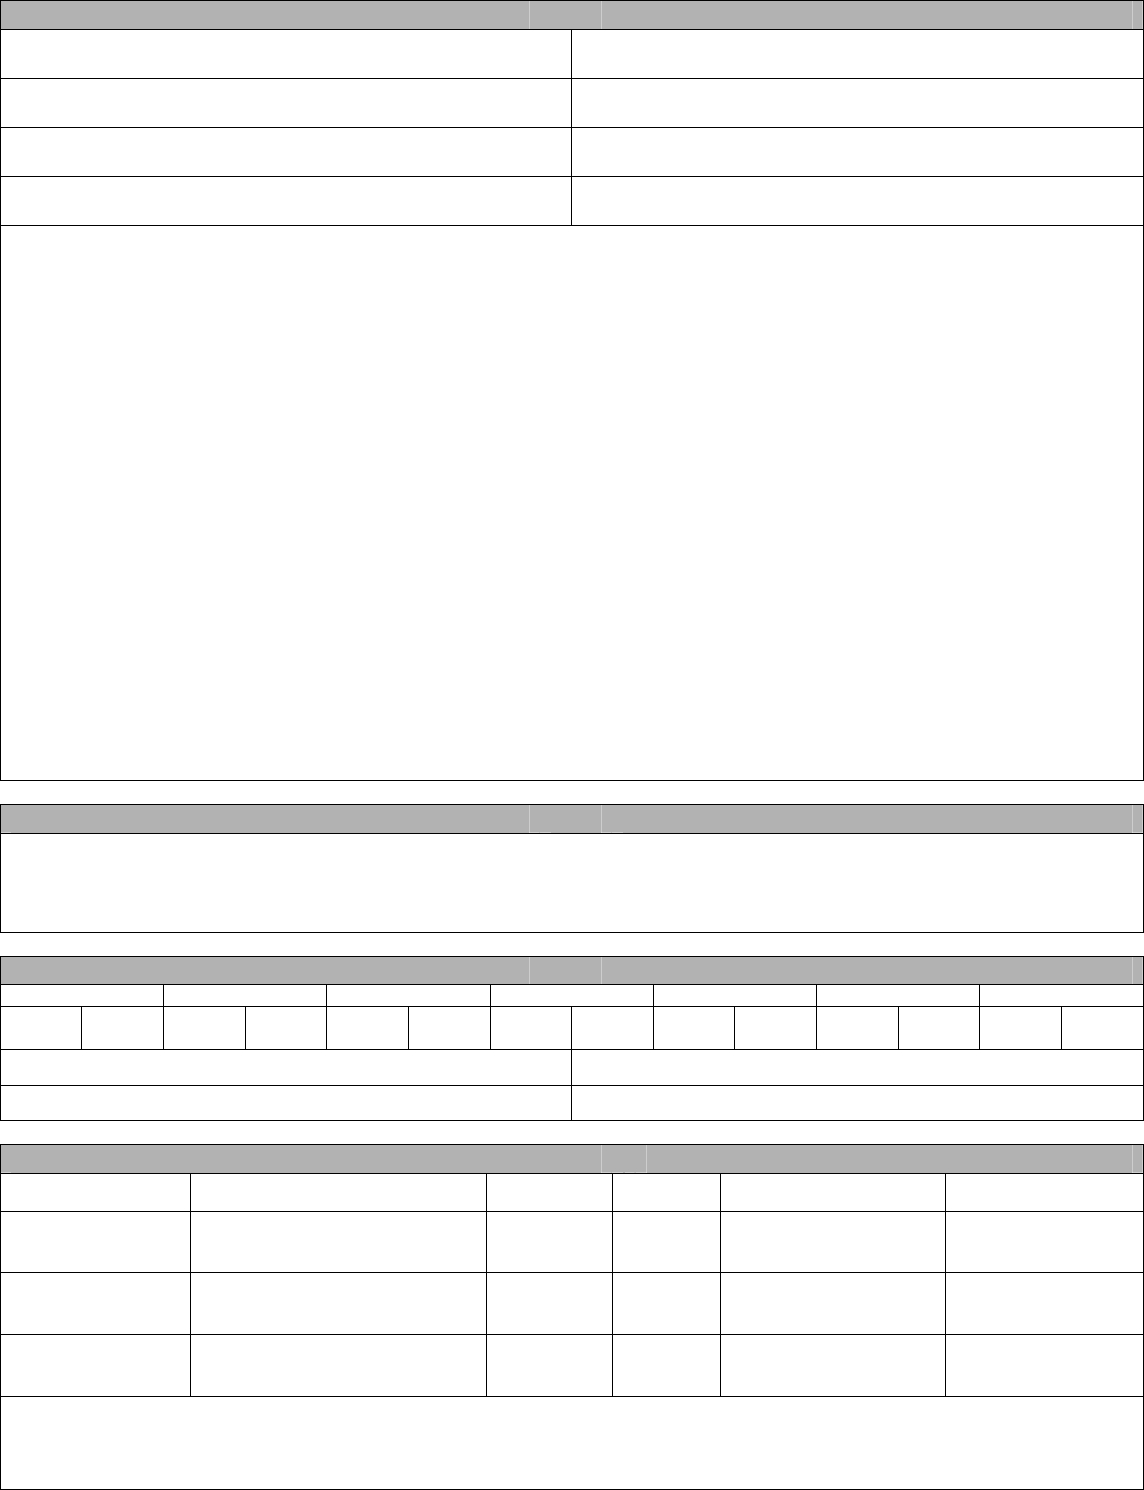 Free Printable Taco Bell Job Application Form Page 2 - Free Printable Taco Bell Application